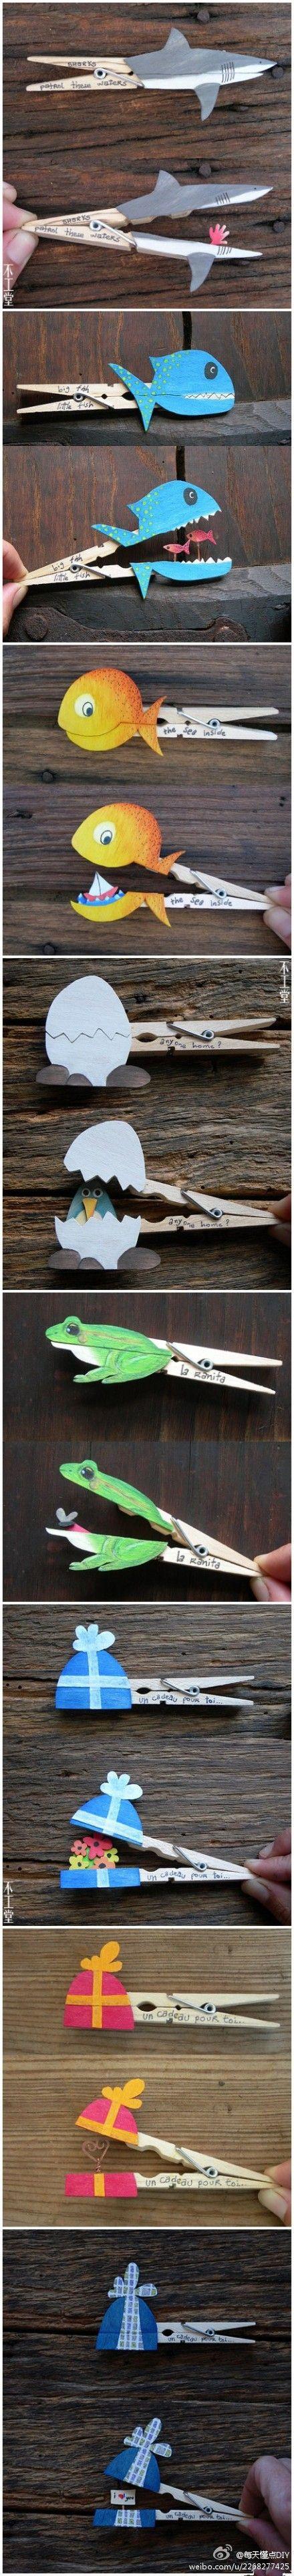 Wasknijper met dieren would this work as a simple machine? lever?